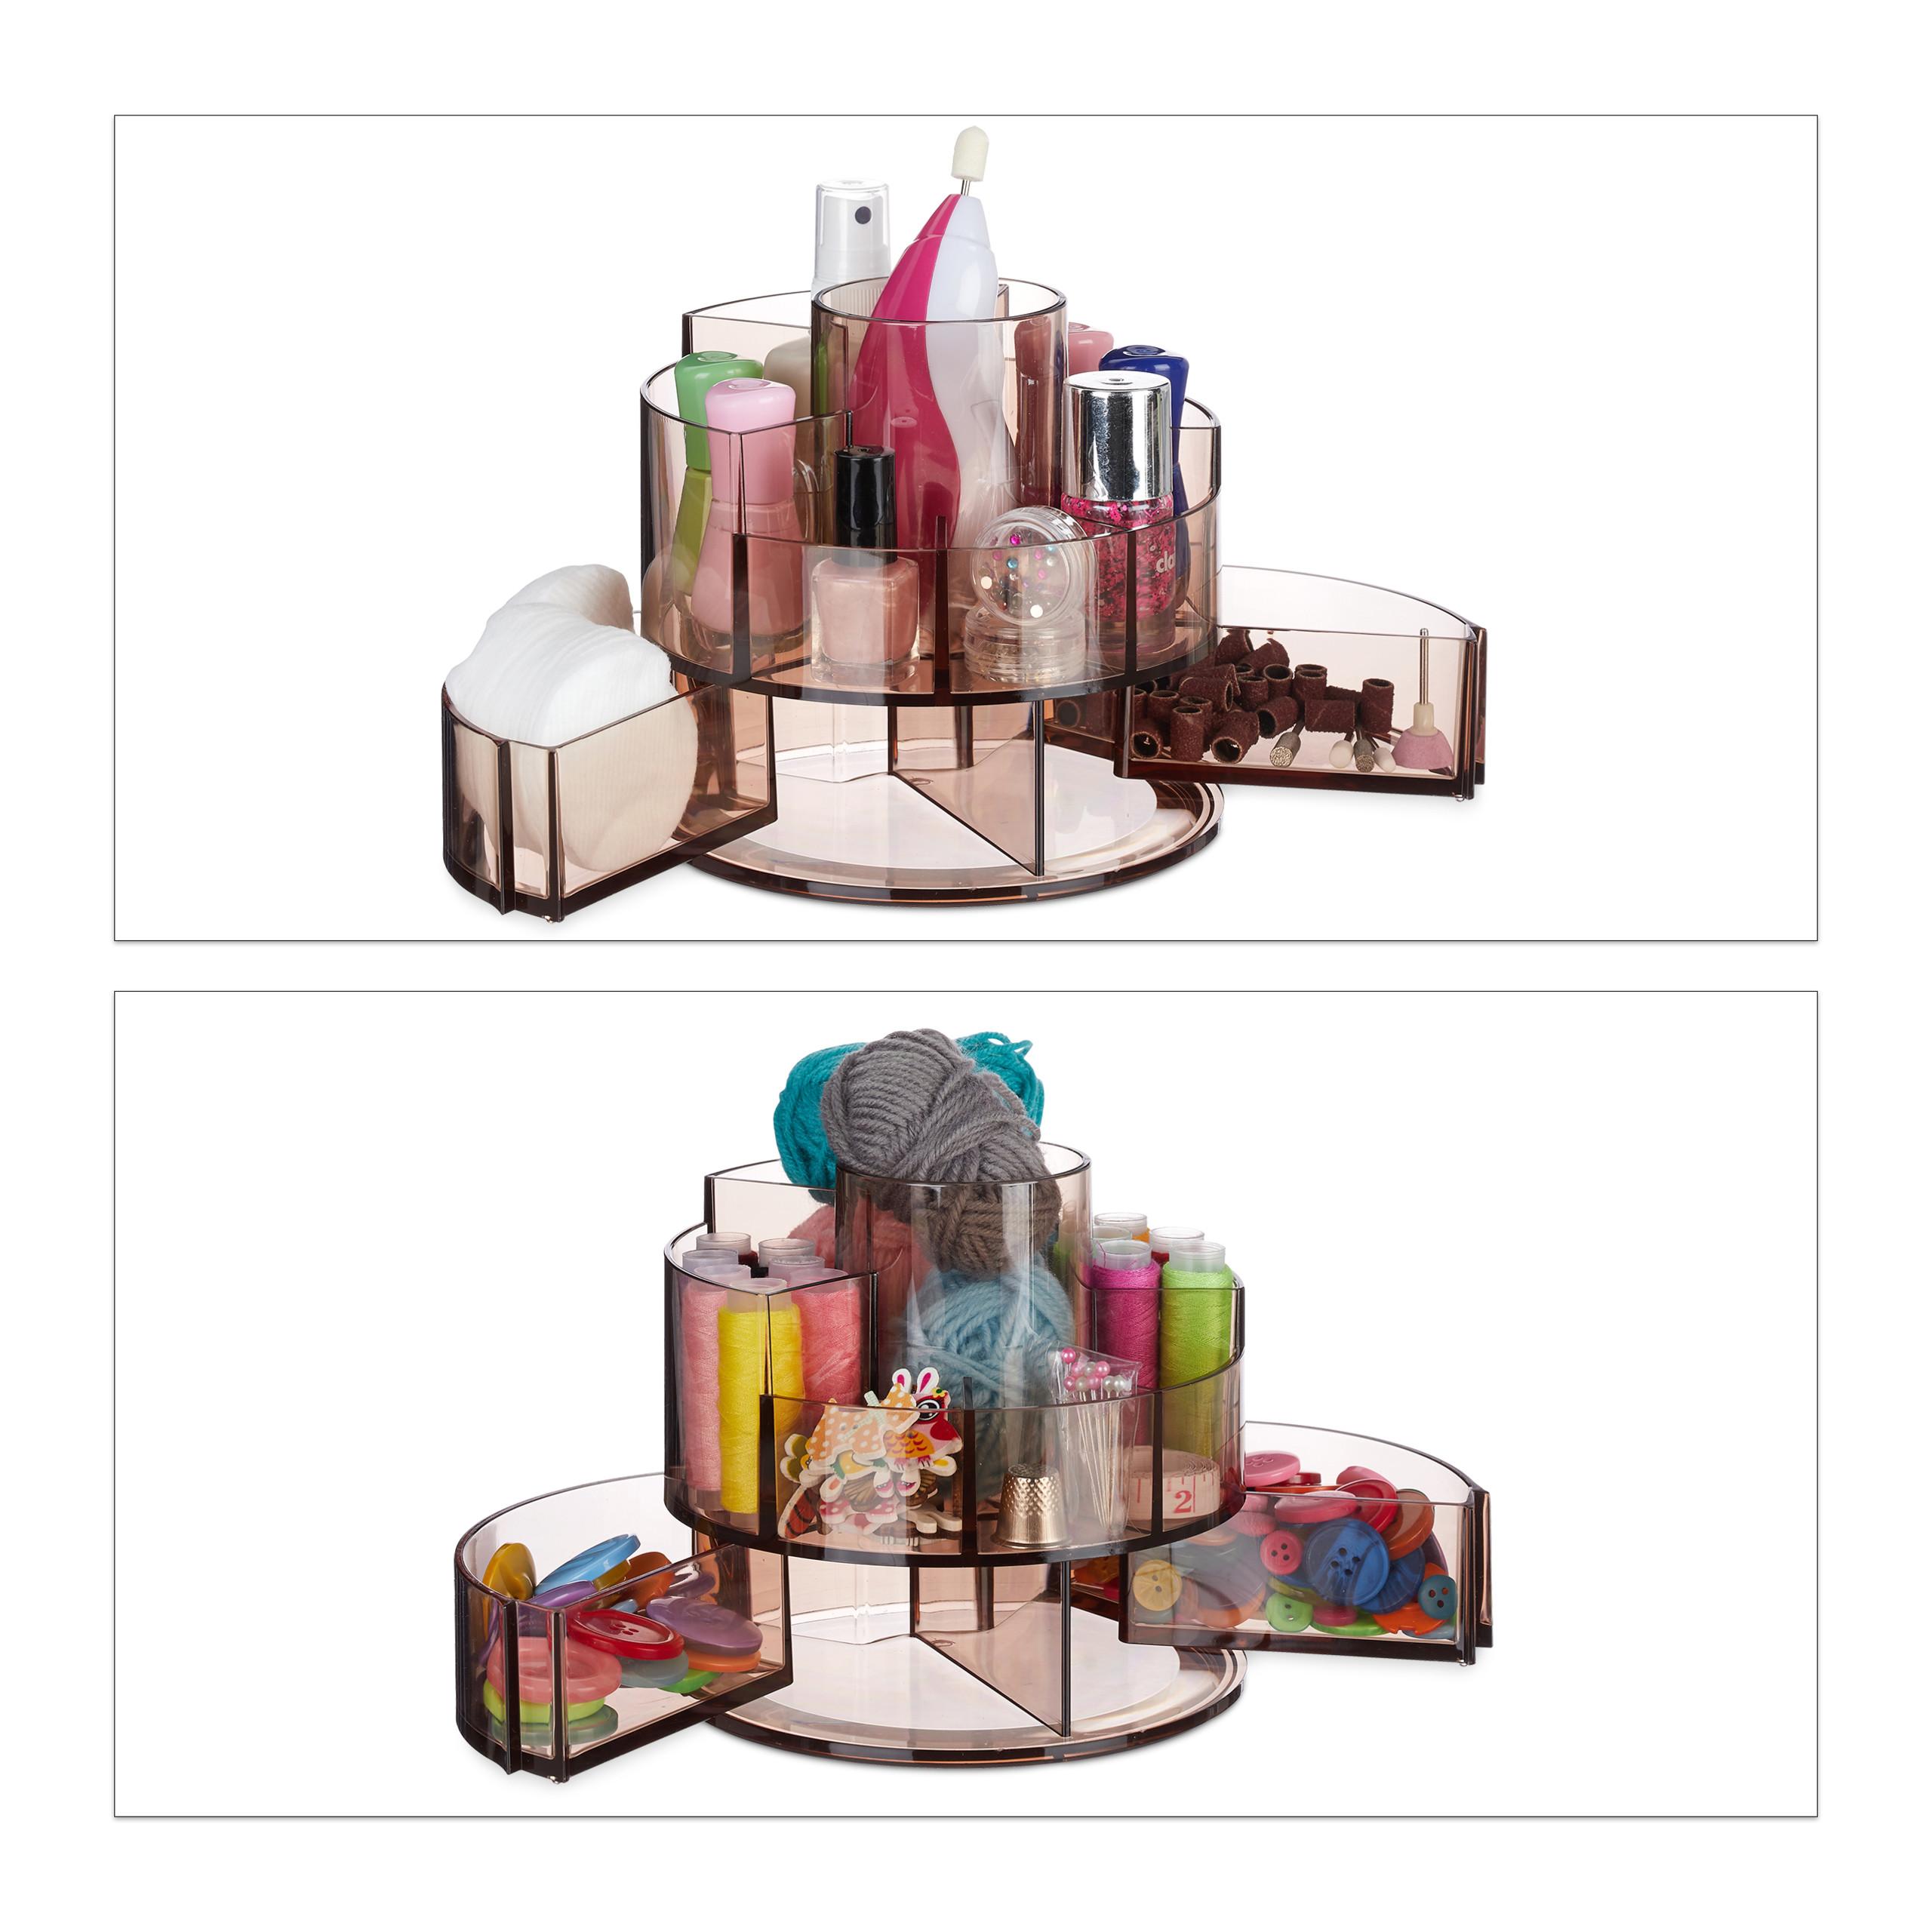 make-up-organizer-acryl-rond-cosmetica-opbergen-opbergsysteem miniatuur 4